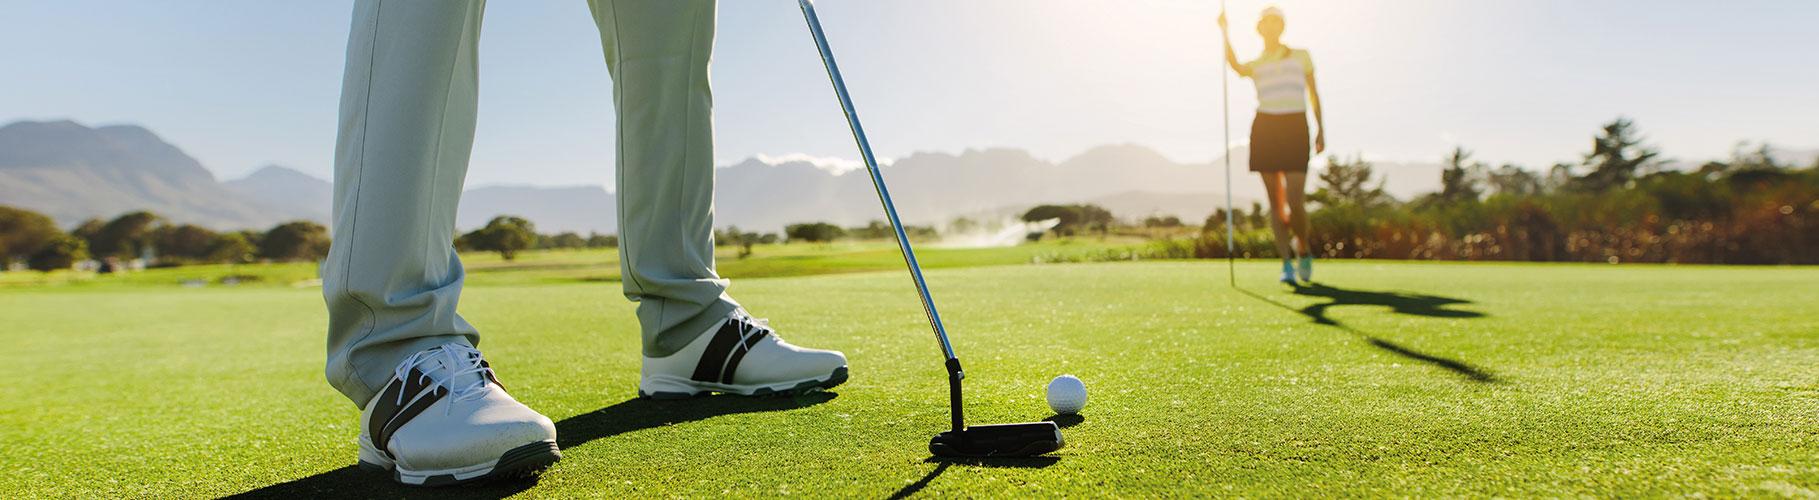 golf-malaga